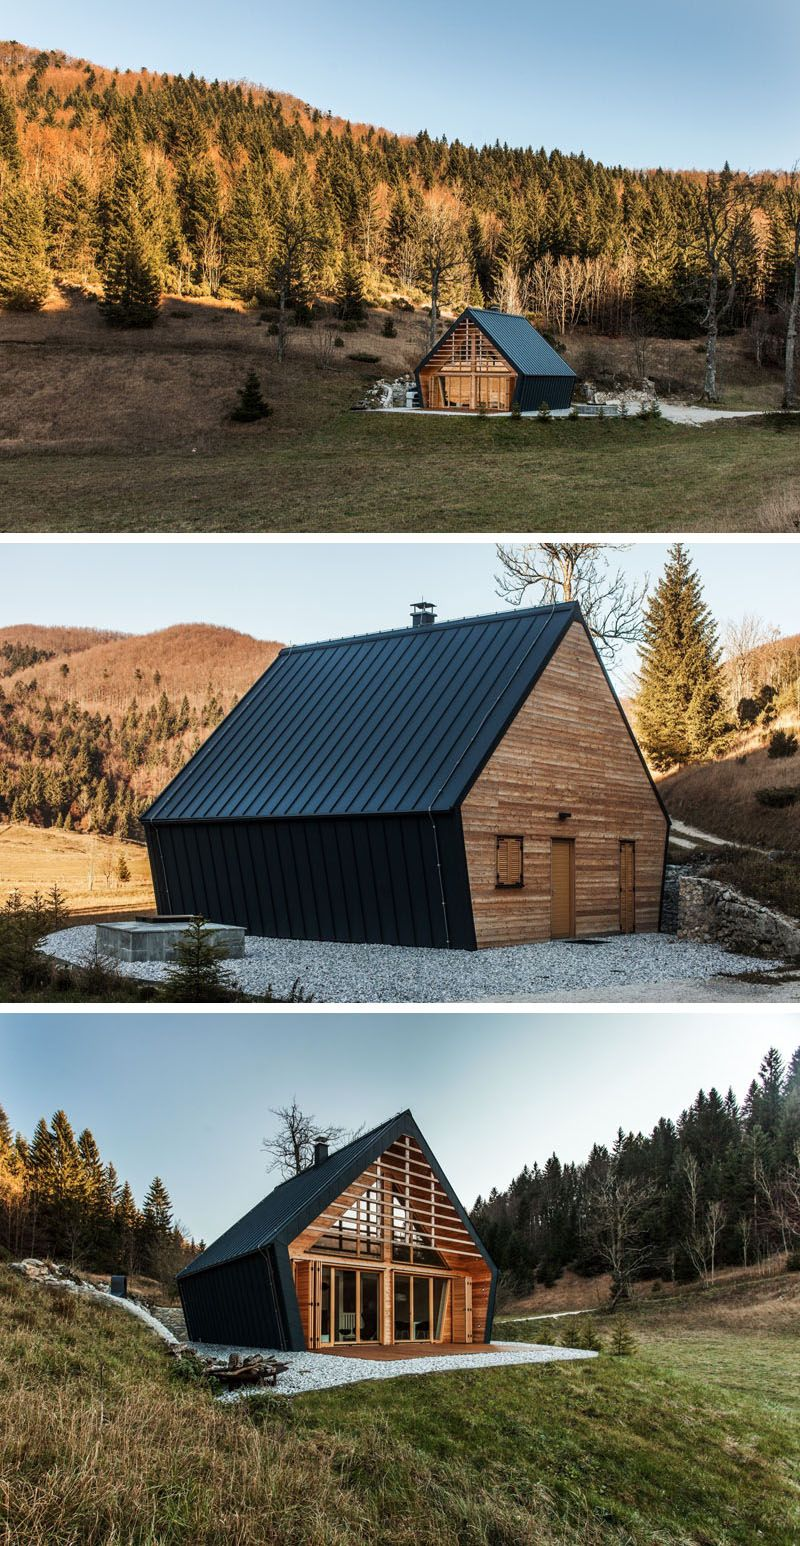 The Dark Exterior This Wood House Encloses A Light Interior